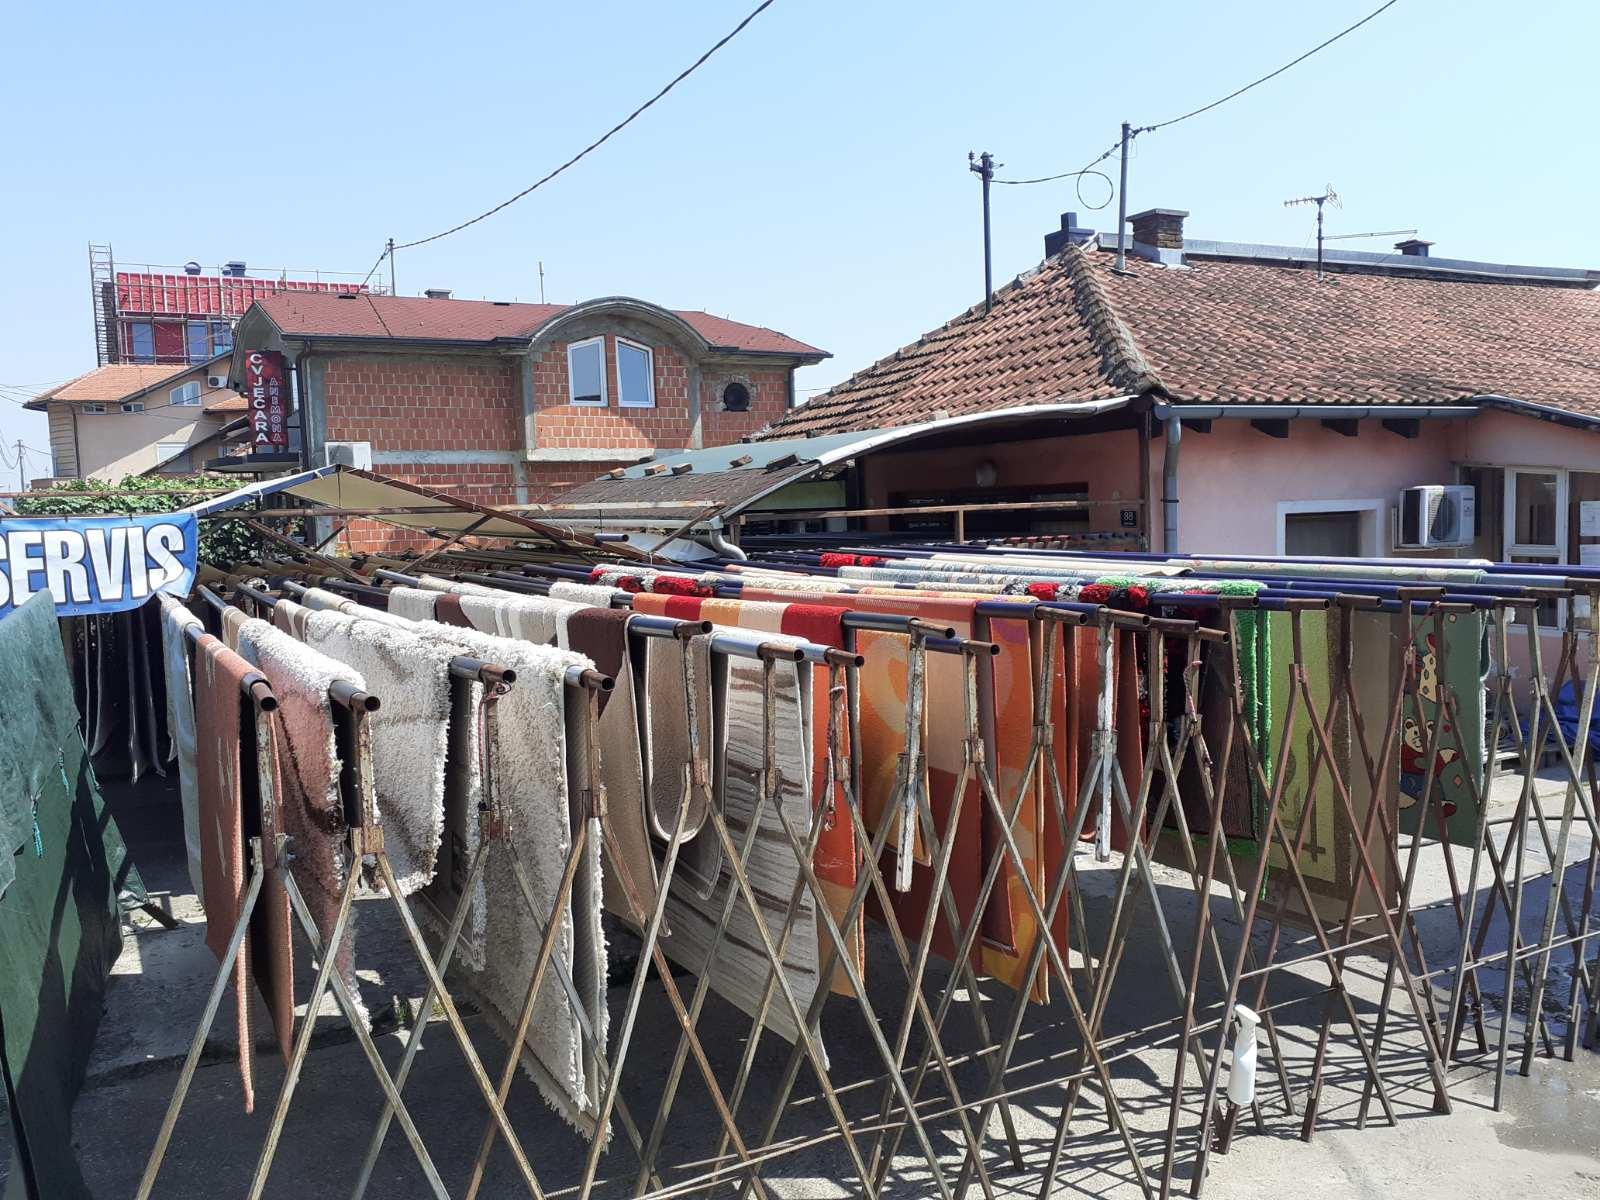 Servis tepih Banja Luka